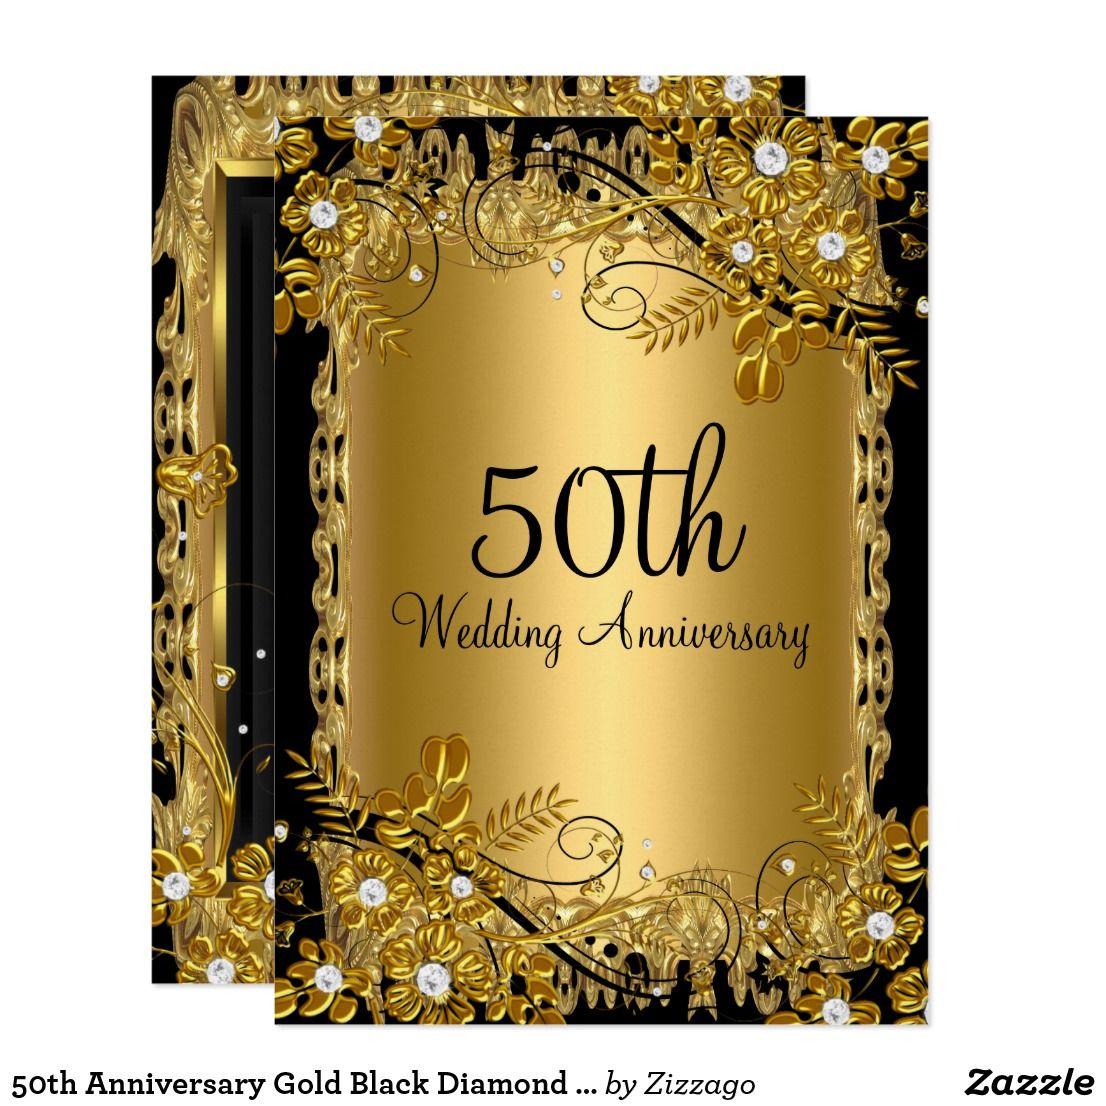 50th Anniversary Gold Black Diamond Floral Swirl Invitation Zazzle Com 50th Anniversary Gold 50th Wedding Anniversary Invitations 50th Anniversary Invitations